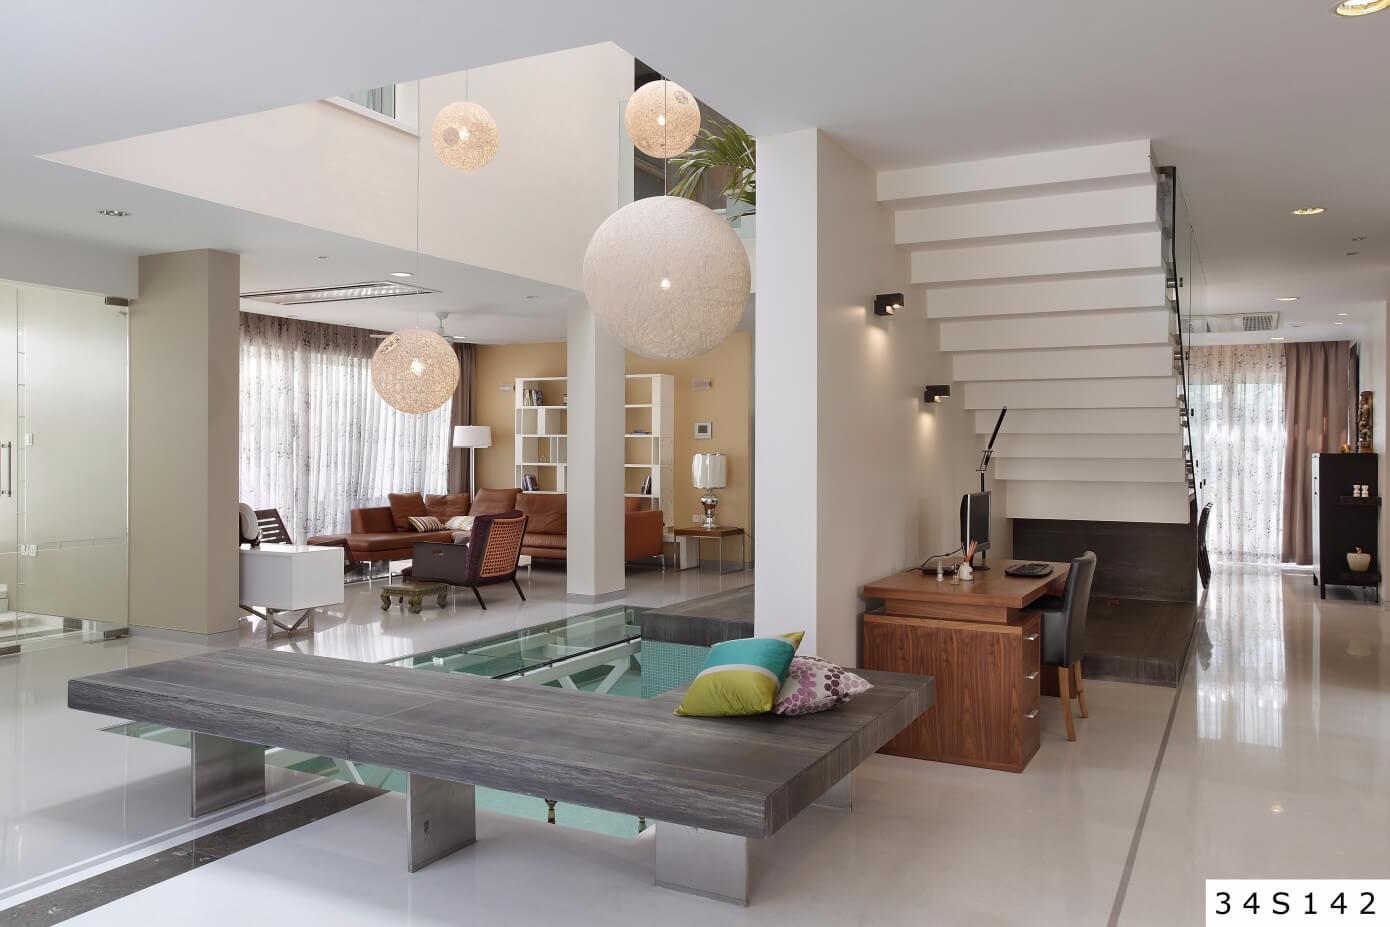 Villa in meenakshi bamboos by moriq homeadore for Villa interior design in hyderabad